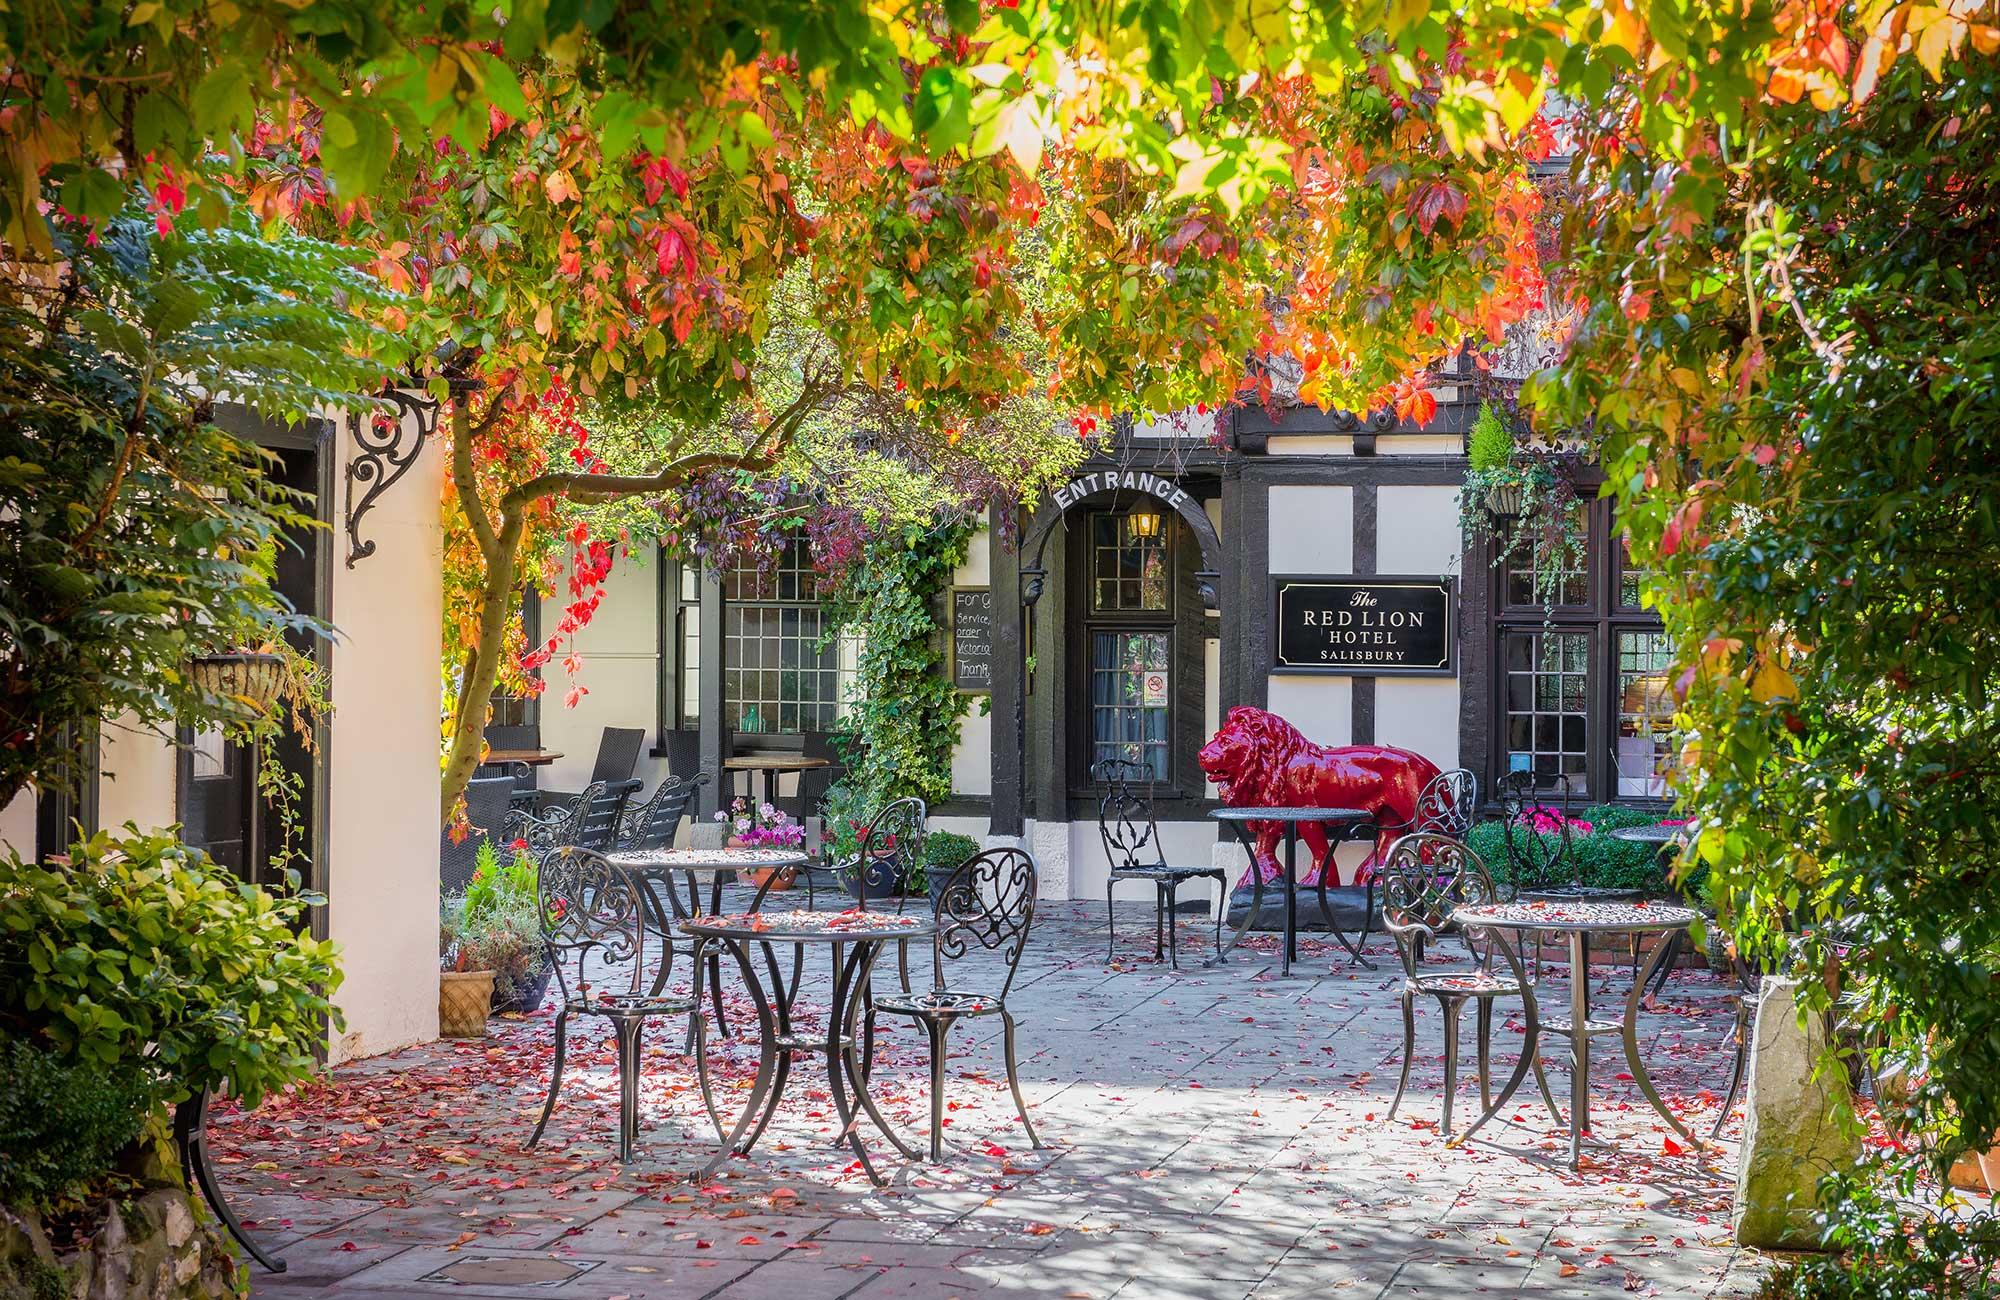 THE RED LION HOTEL SALISBURY